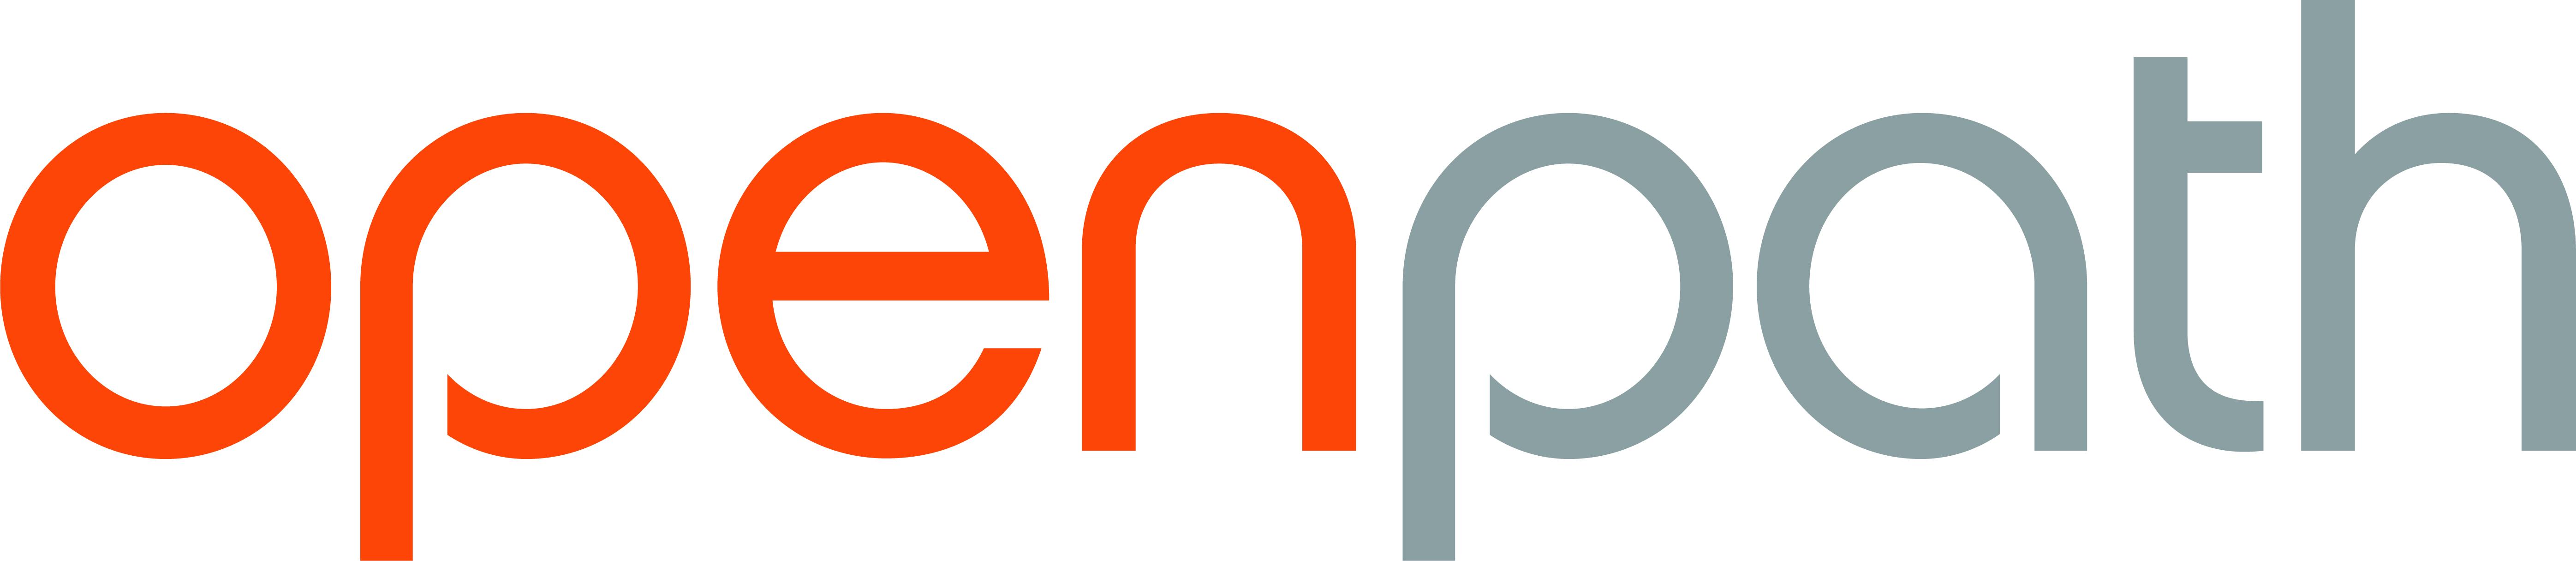 Openpath Company Logo